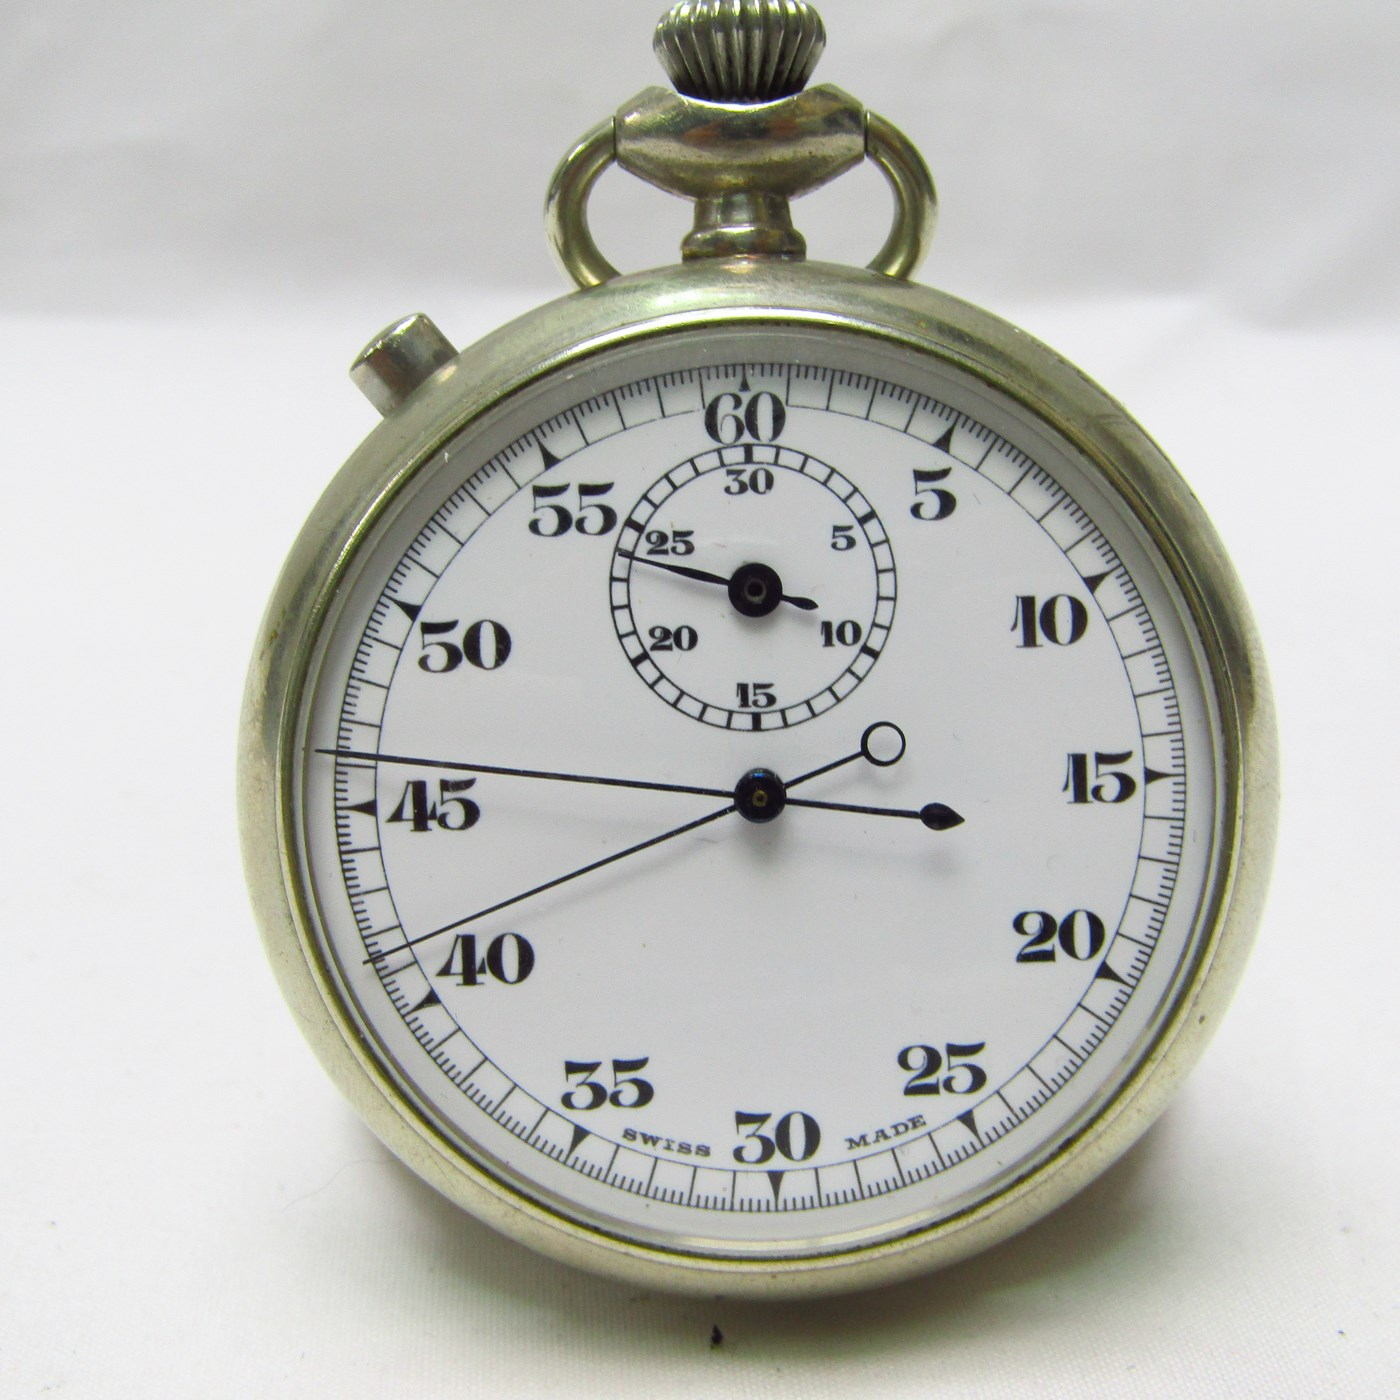 Cronómetro Suizo de Bolsillo, lepine, de Doble Ratrapante. Ca. 1900